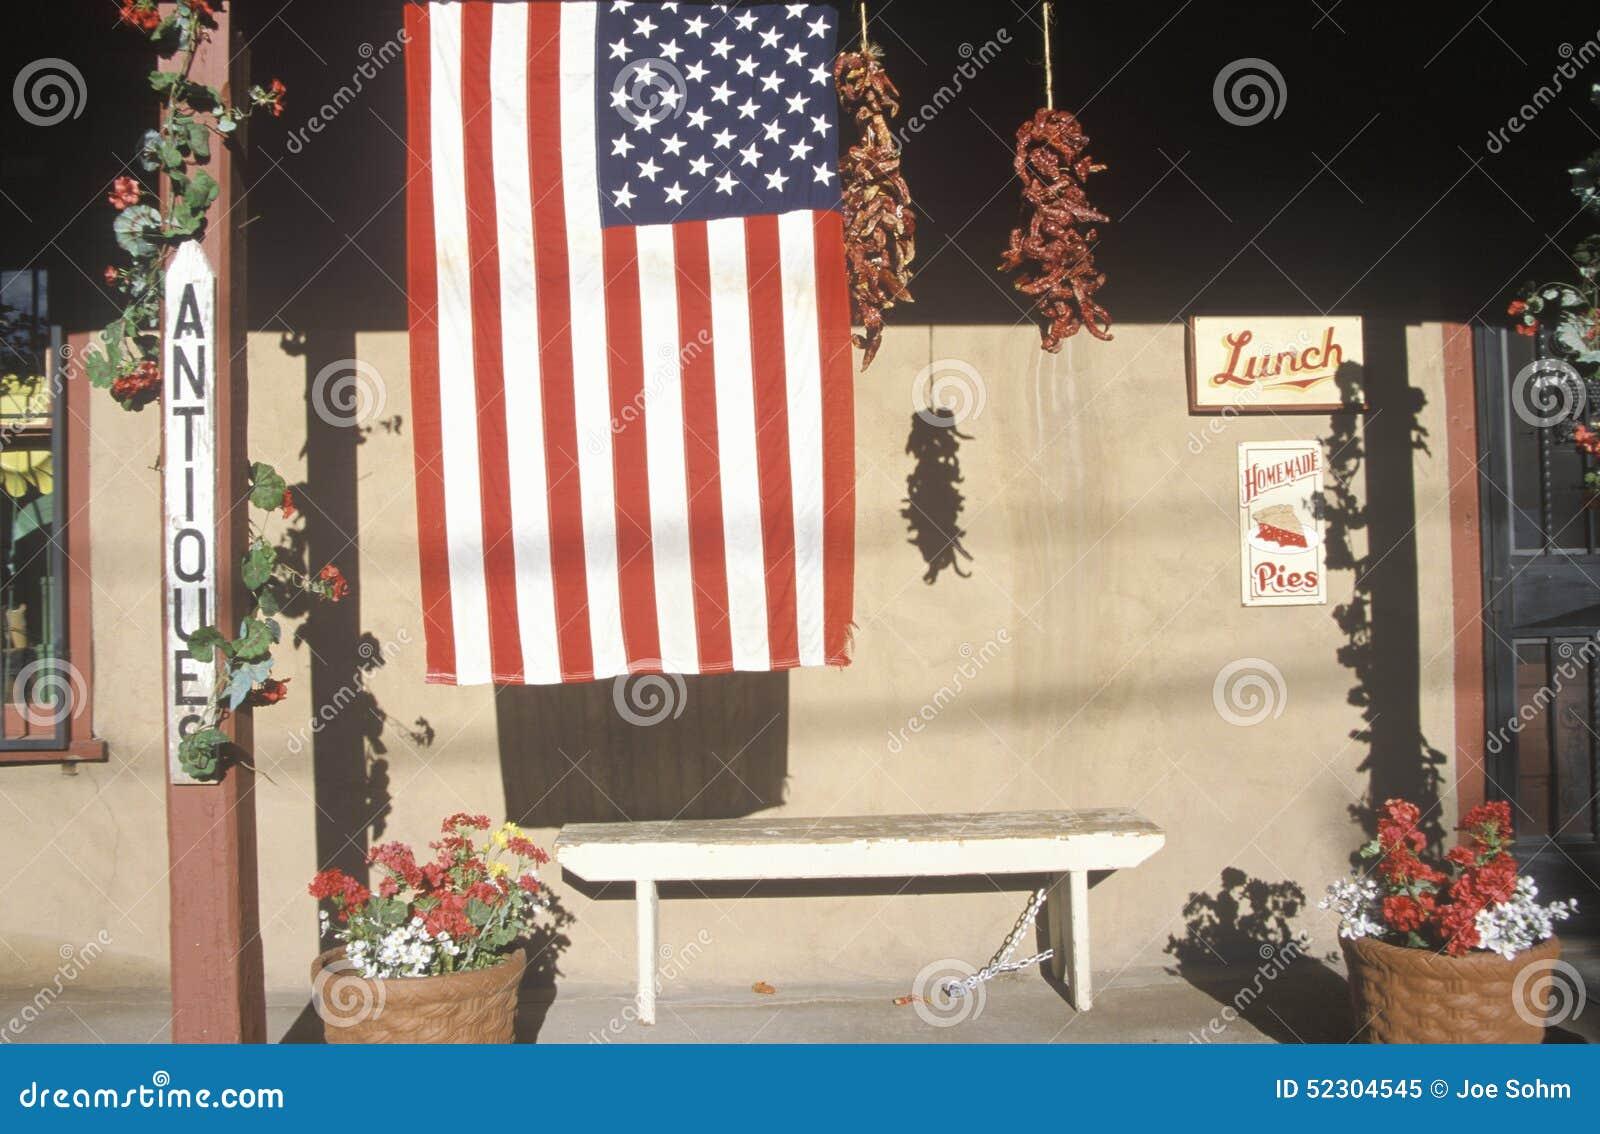 Amerikaanse Vlag voor Antieke Opslag, Santa Fe, New Mexico